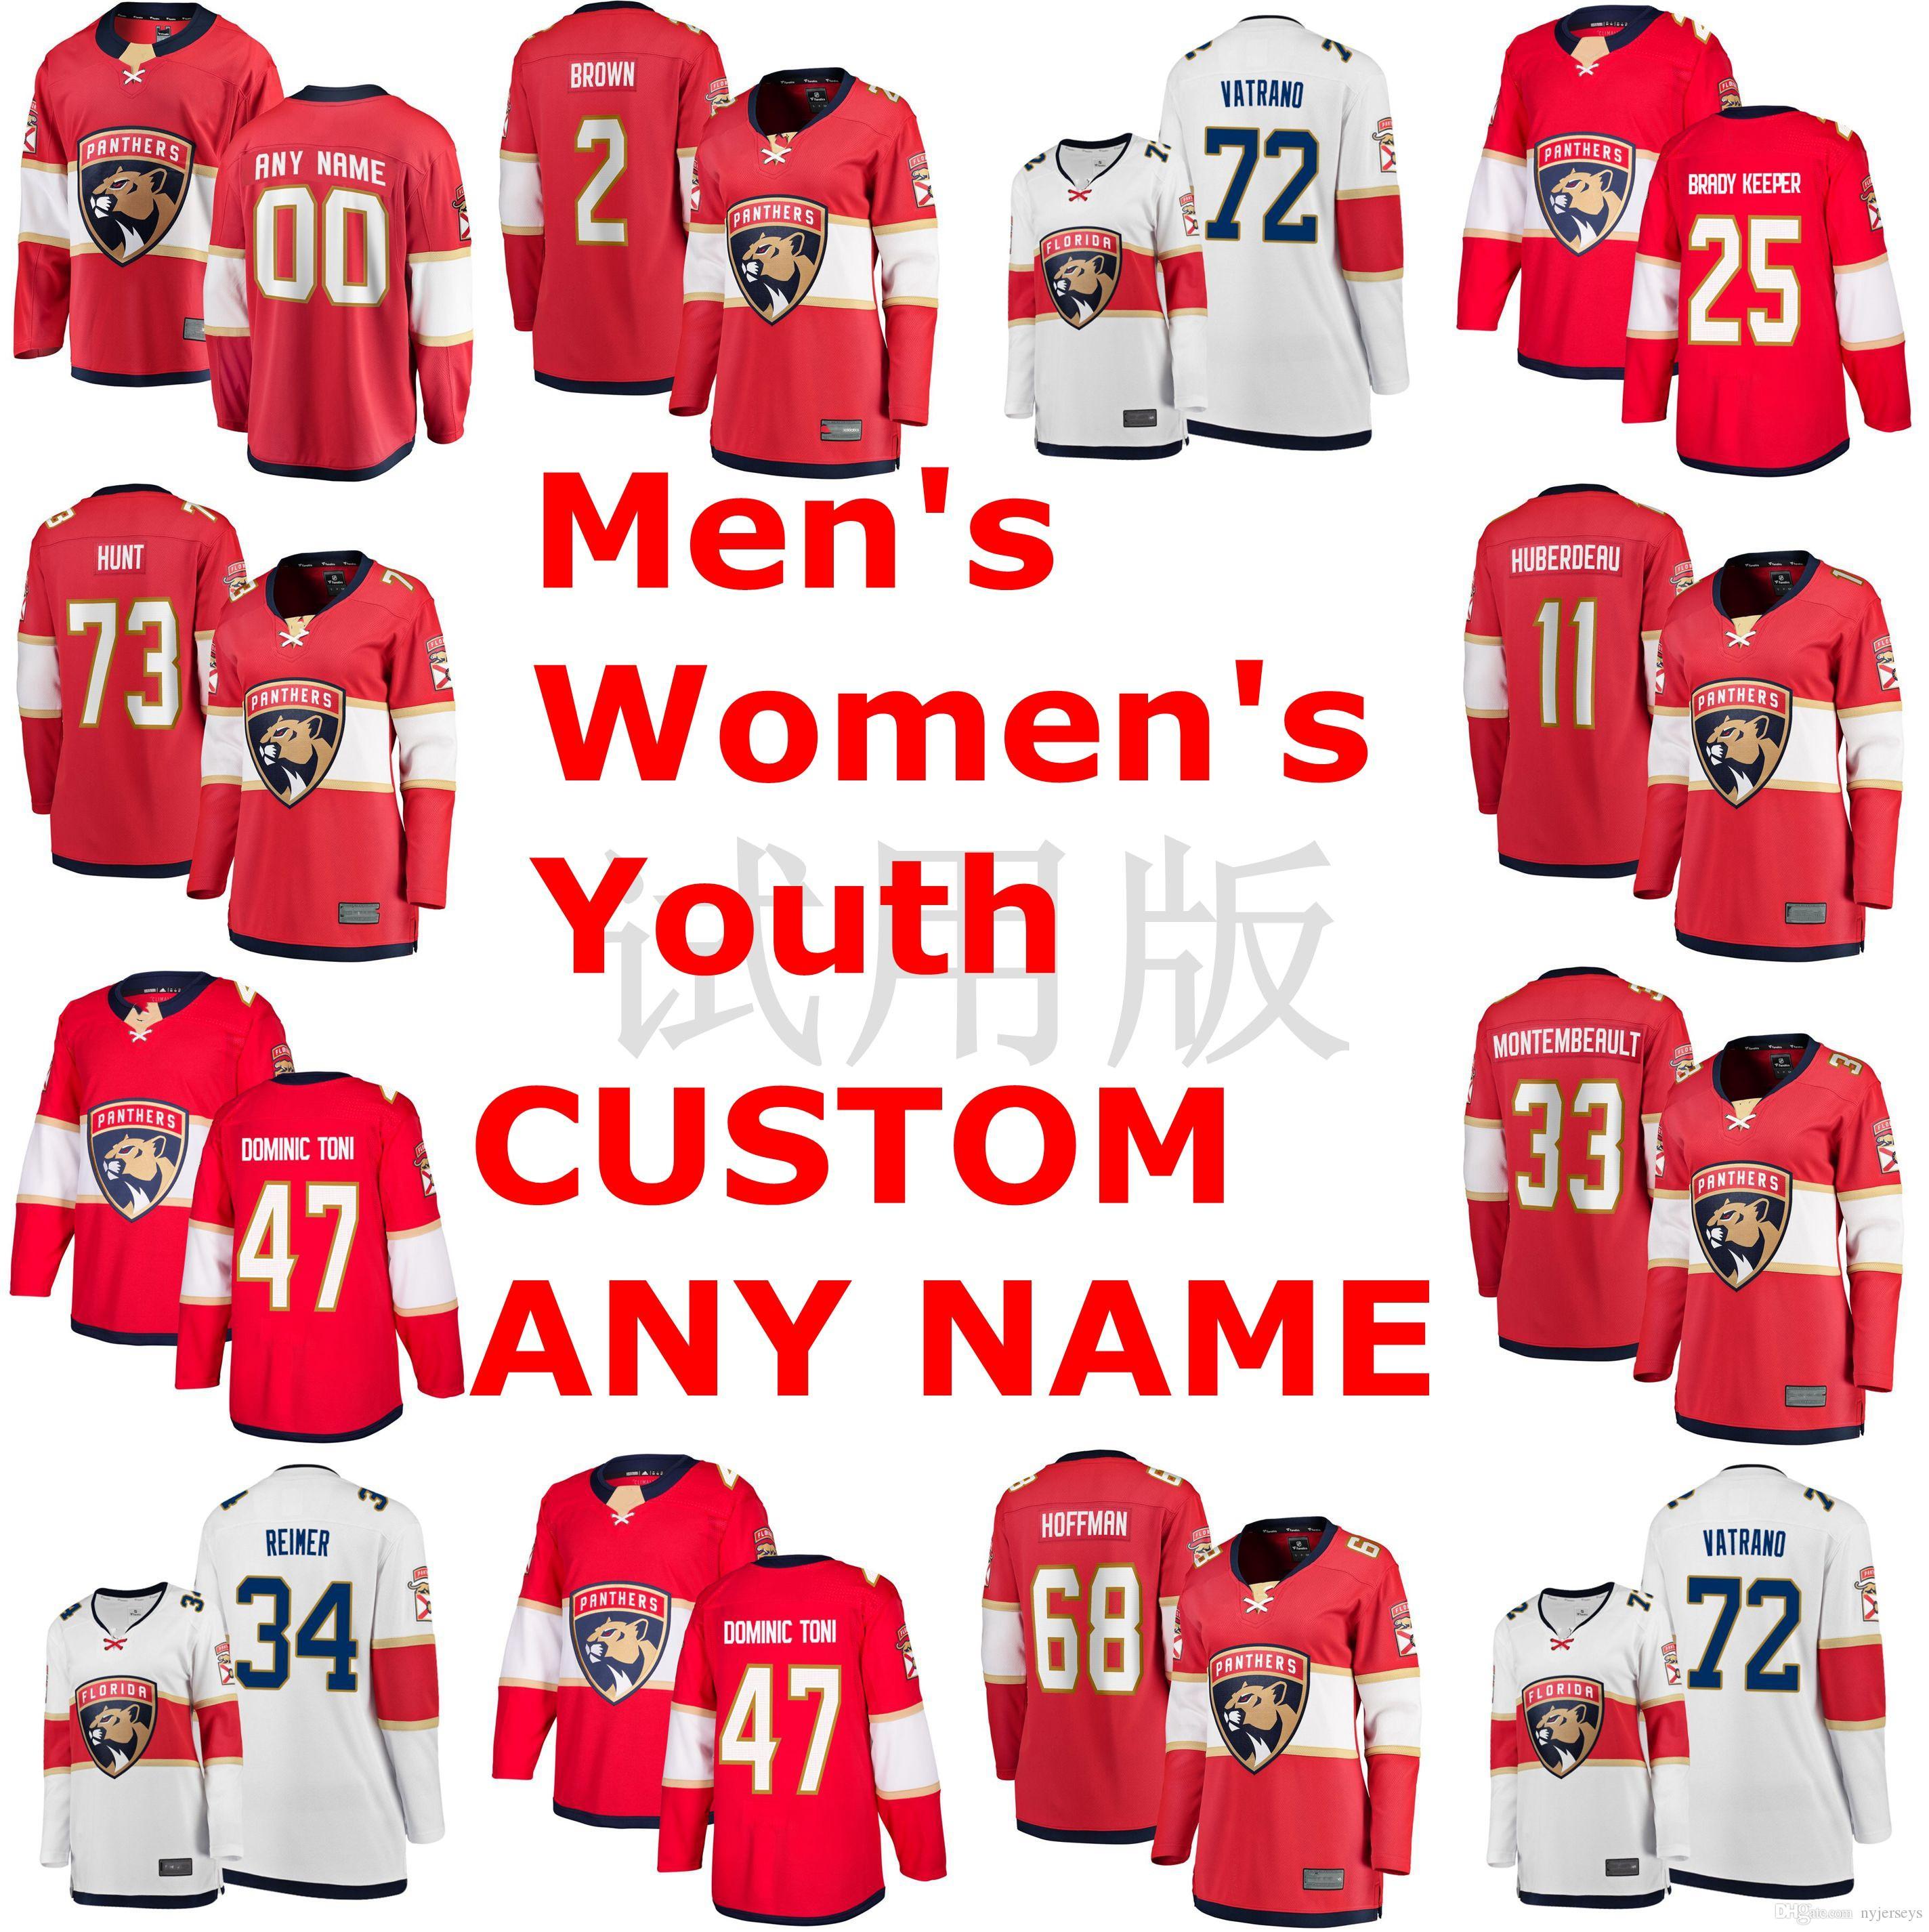 Florida Panthers Jerseys Josh Brown Jersey Frank Vatrano Dominic Toninato Dominic Toninato Jayce Hawryluk Red White Hockey Jerseys Custom St